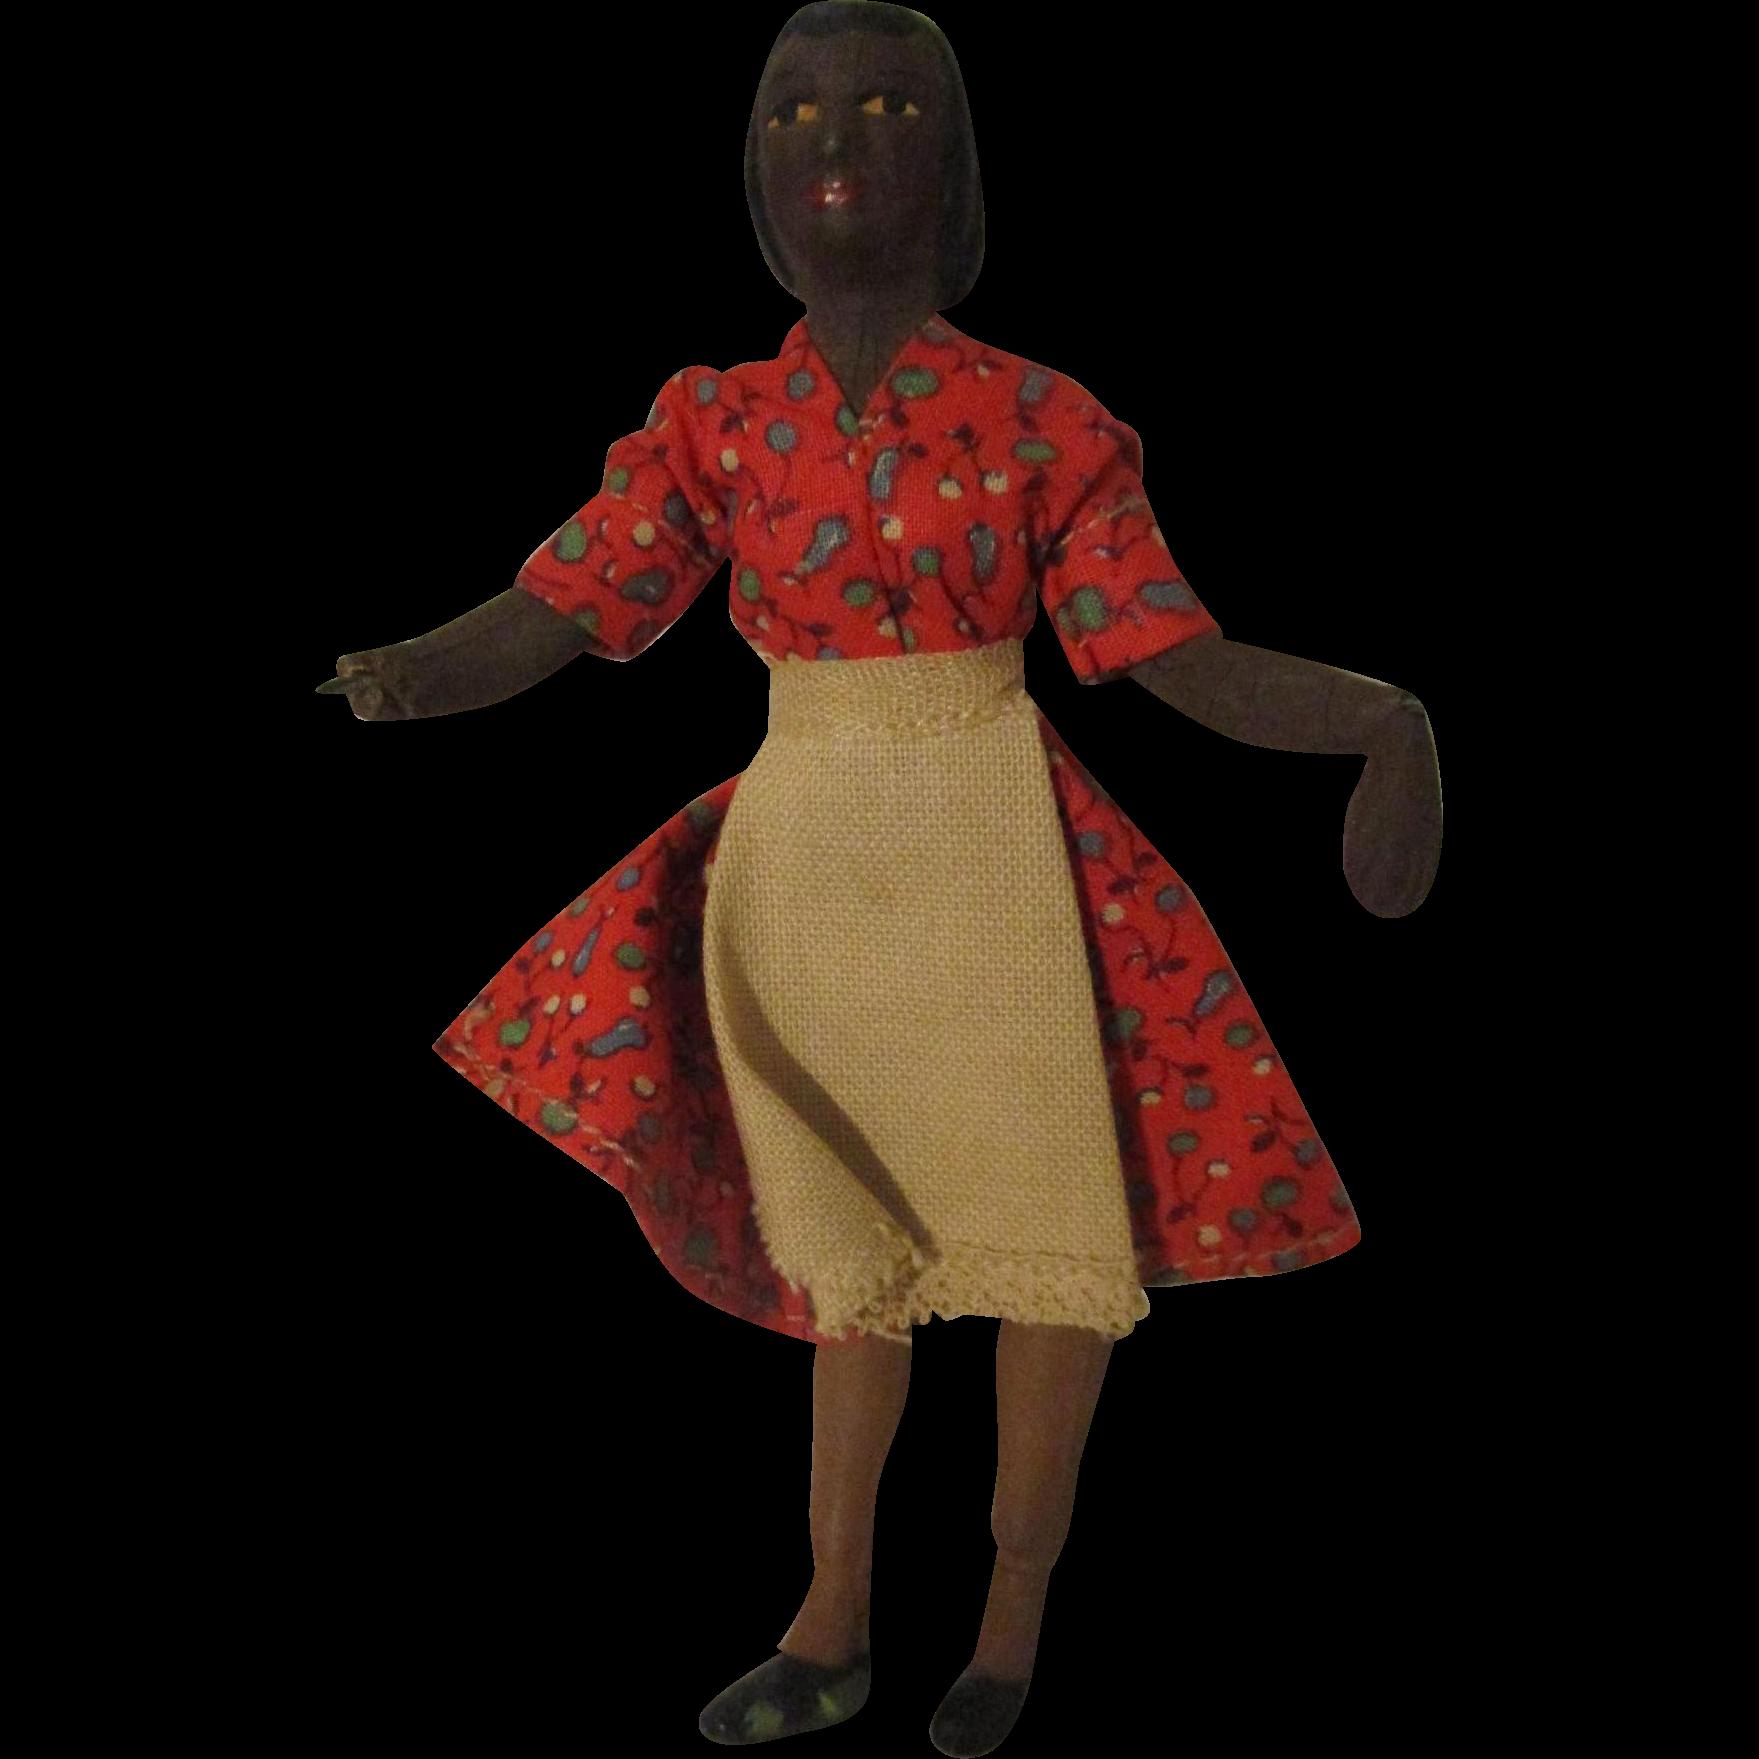 Black Doll House Doll